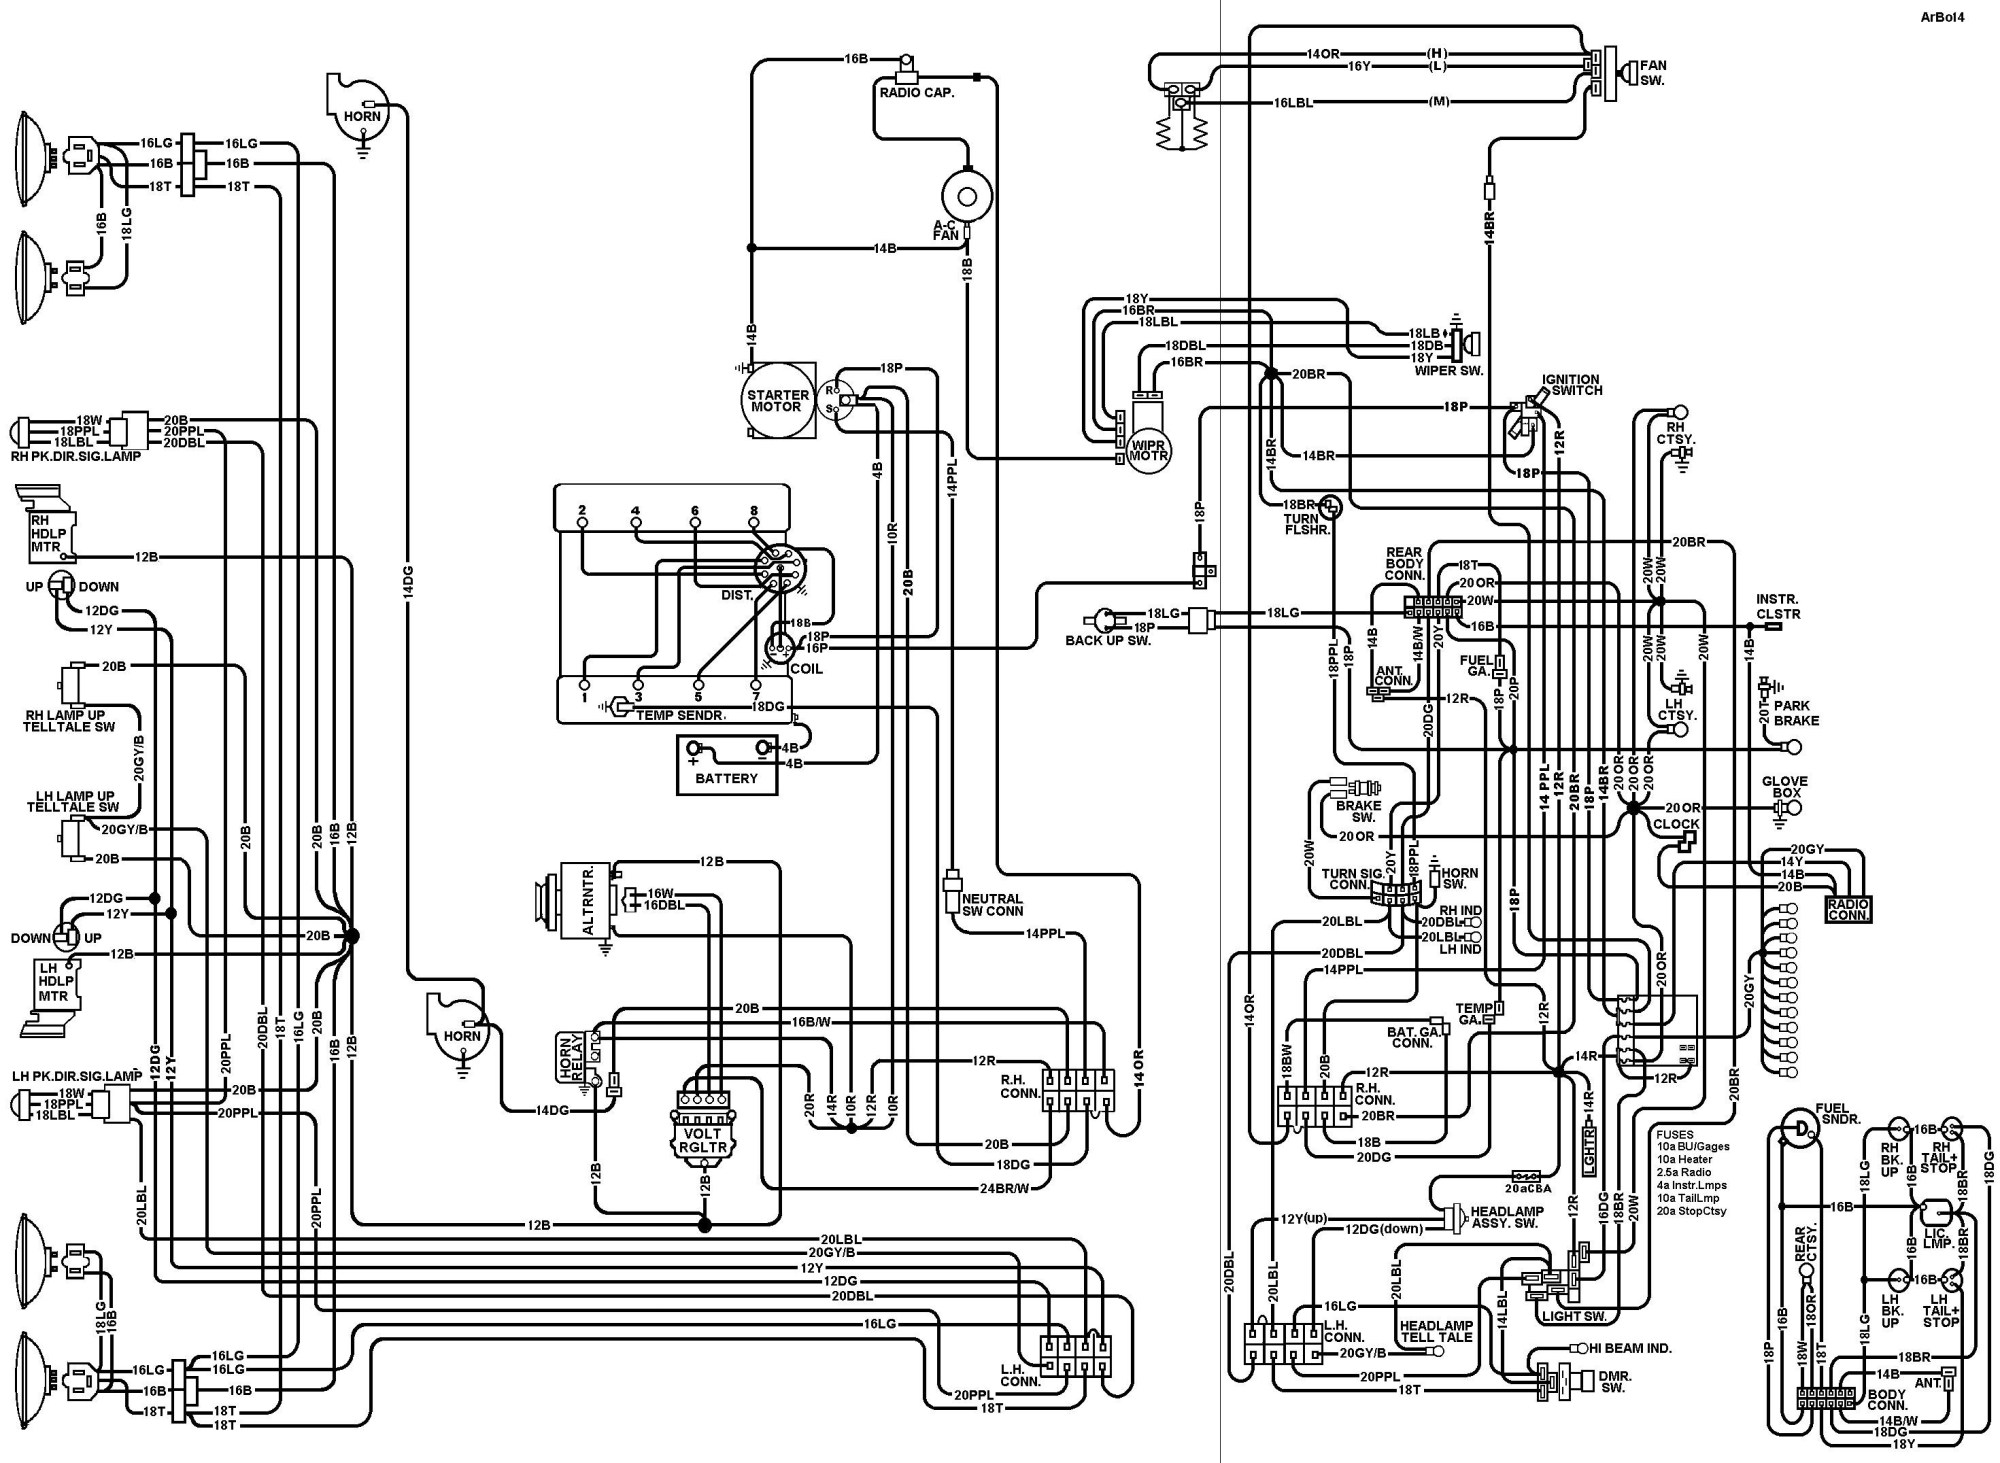 66 Corvette Wiring Schematic - 1972 ford wiring diagram wiring ... on